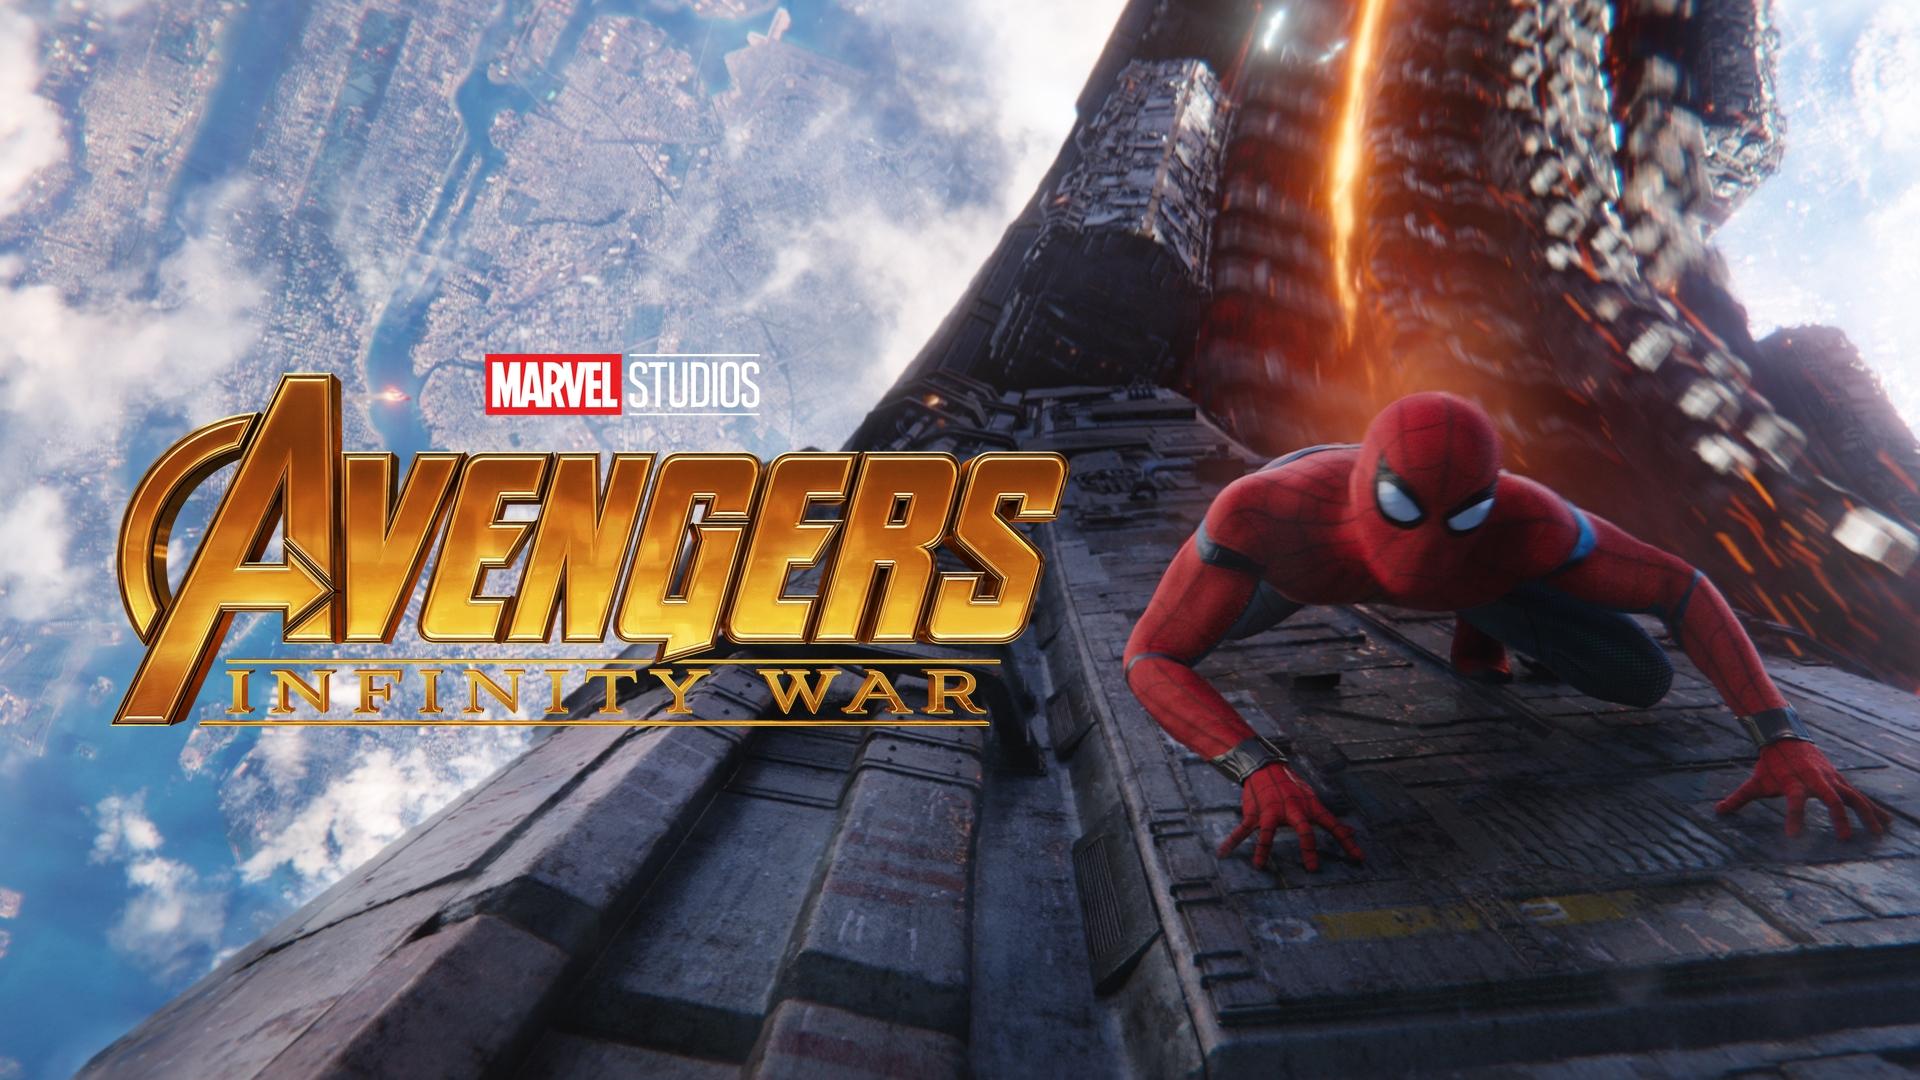 AIW featured Spider-Man Q Ship